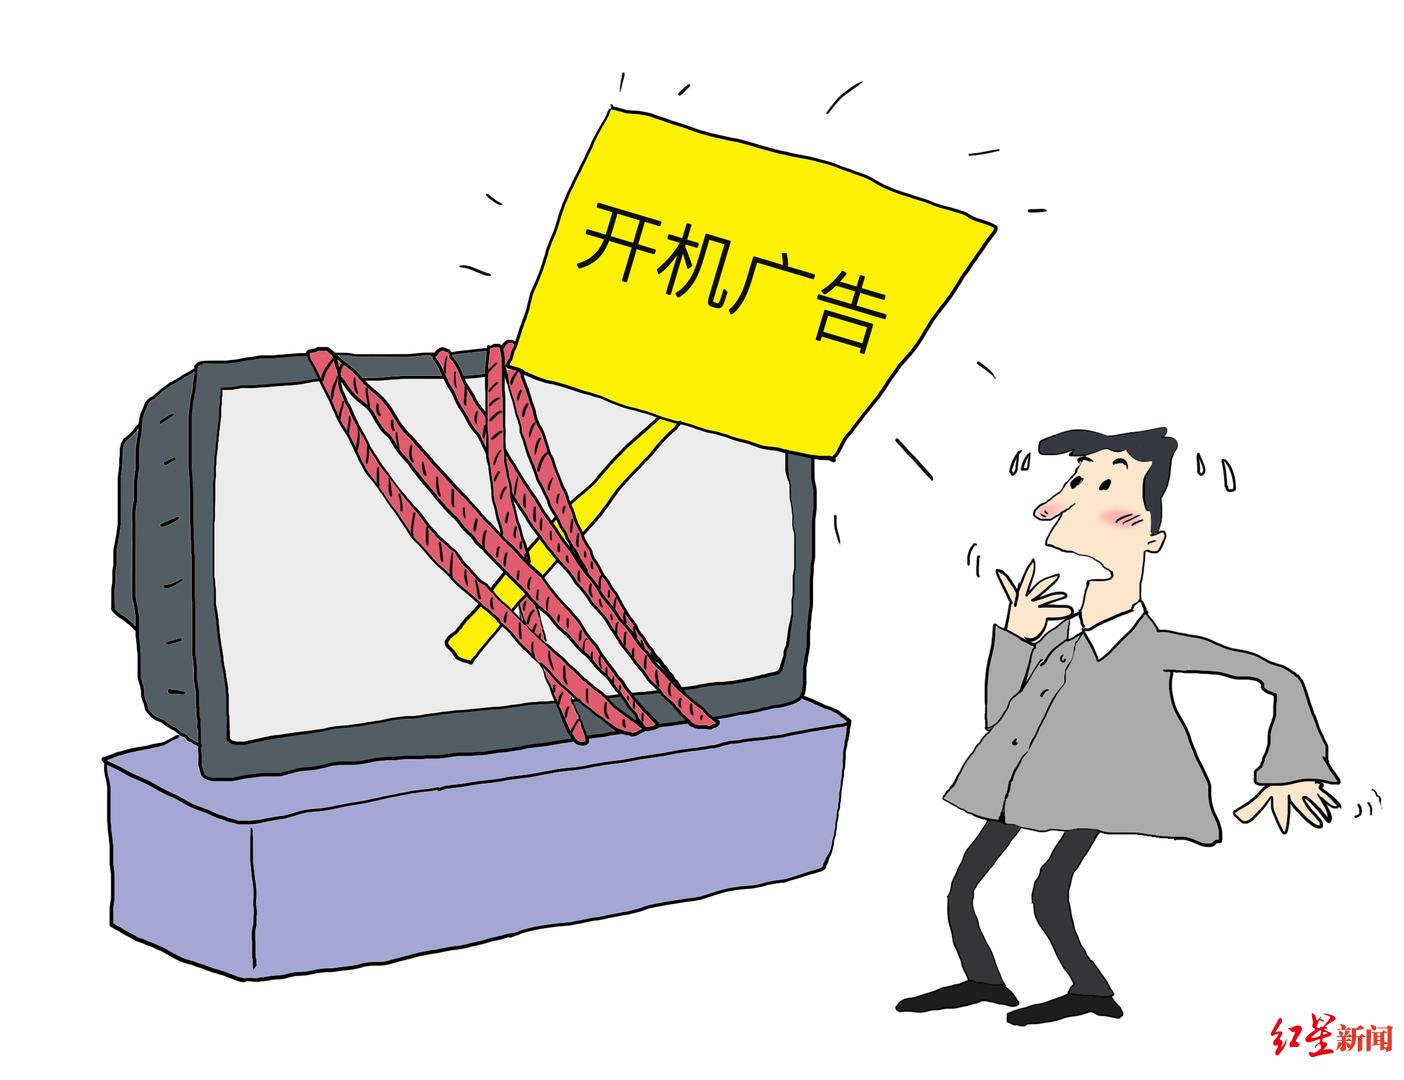 http://www.rhgnhl.live/shumaguangdian/484730.html